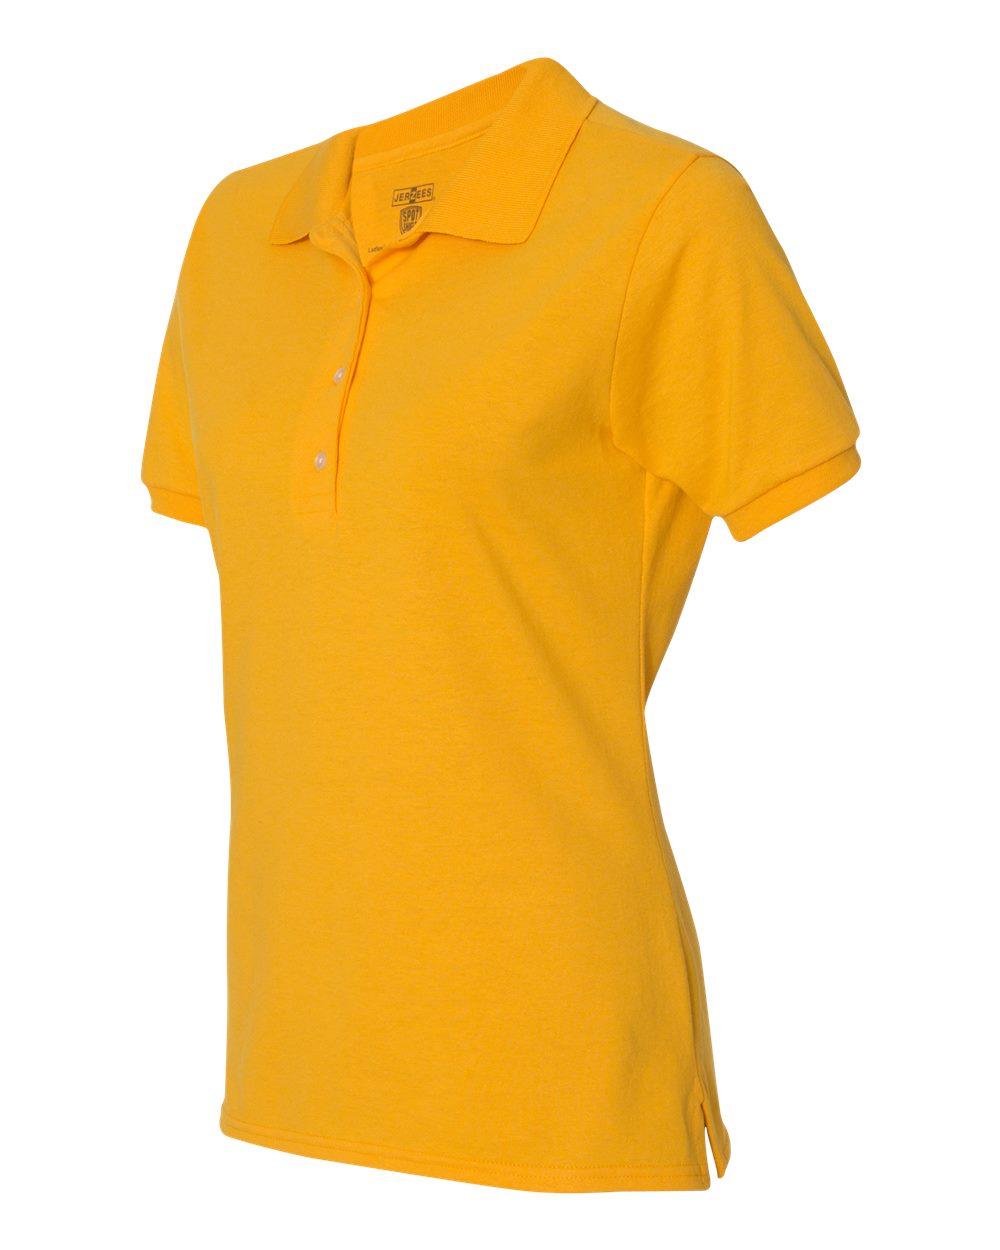 Jerzees-Women-039-s-5-6-oz-50-50-Jersey-Polo-with-SpotShield-437W-S-2XL thumbnail 6